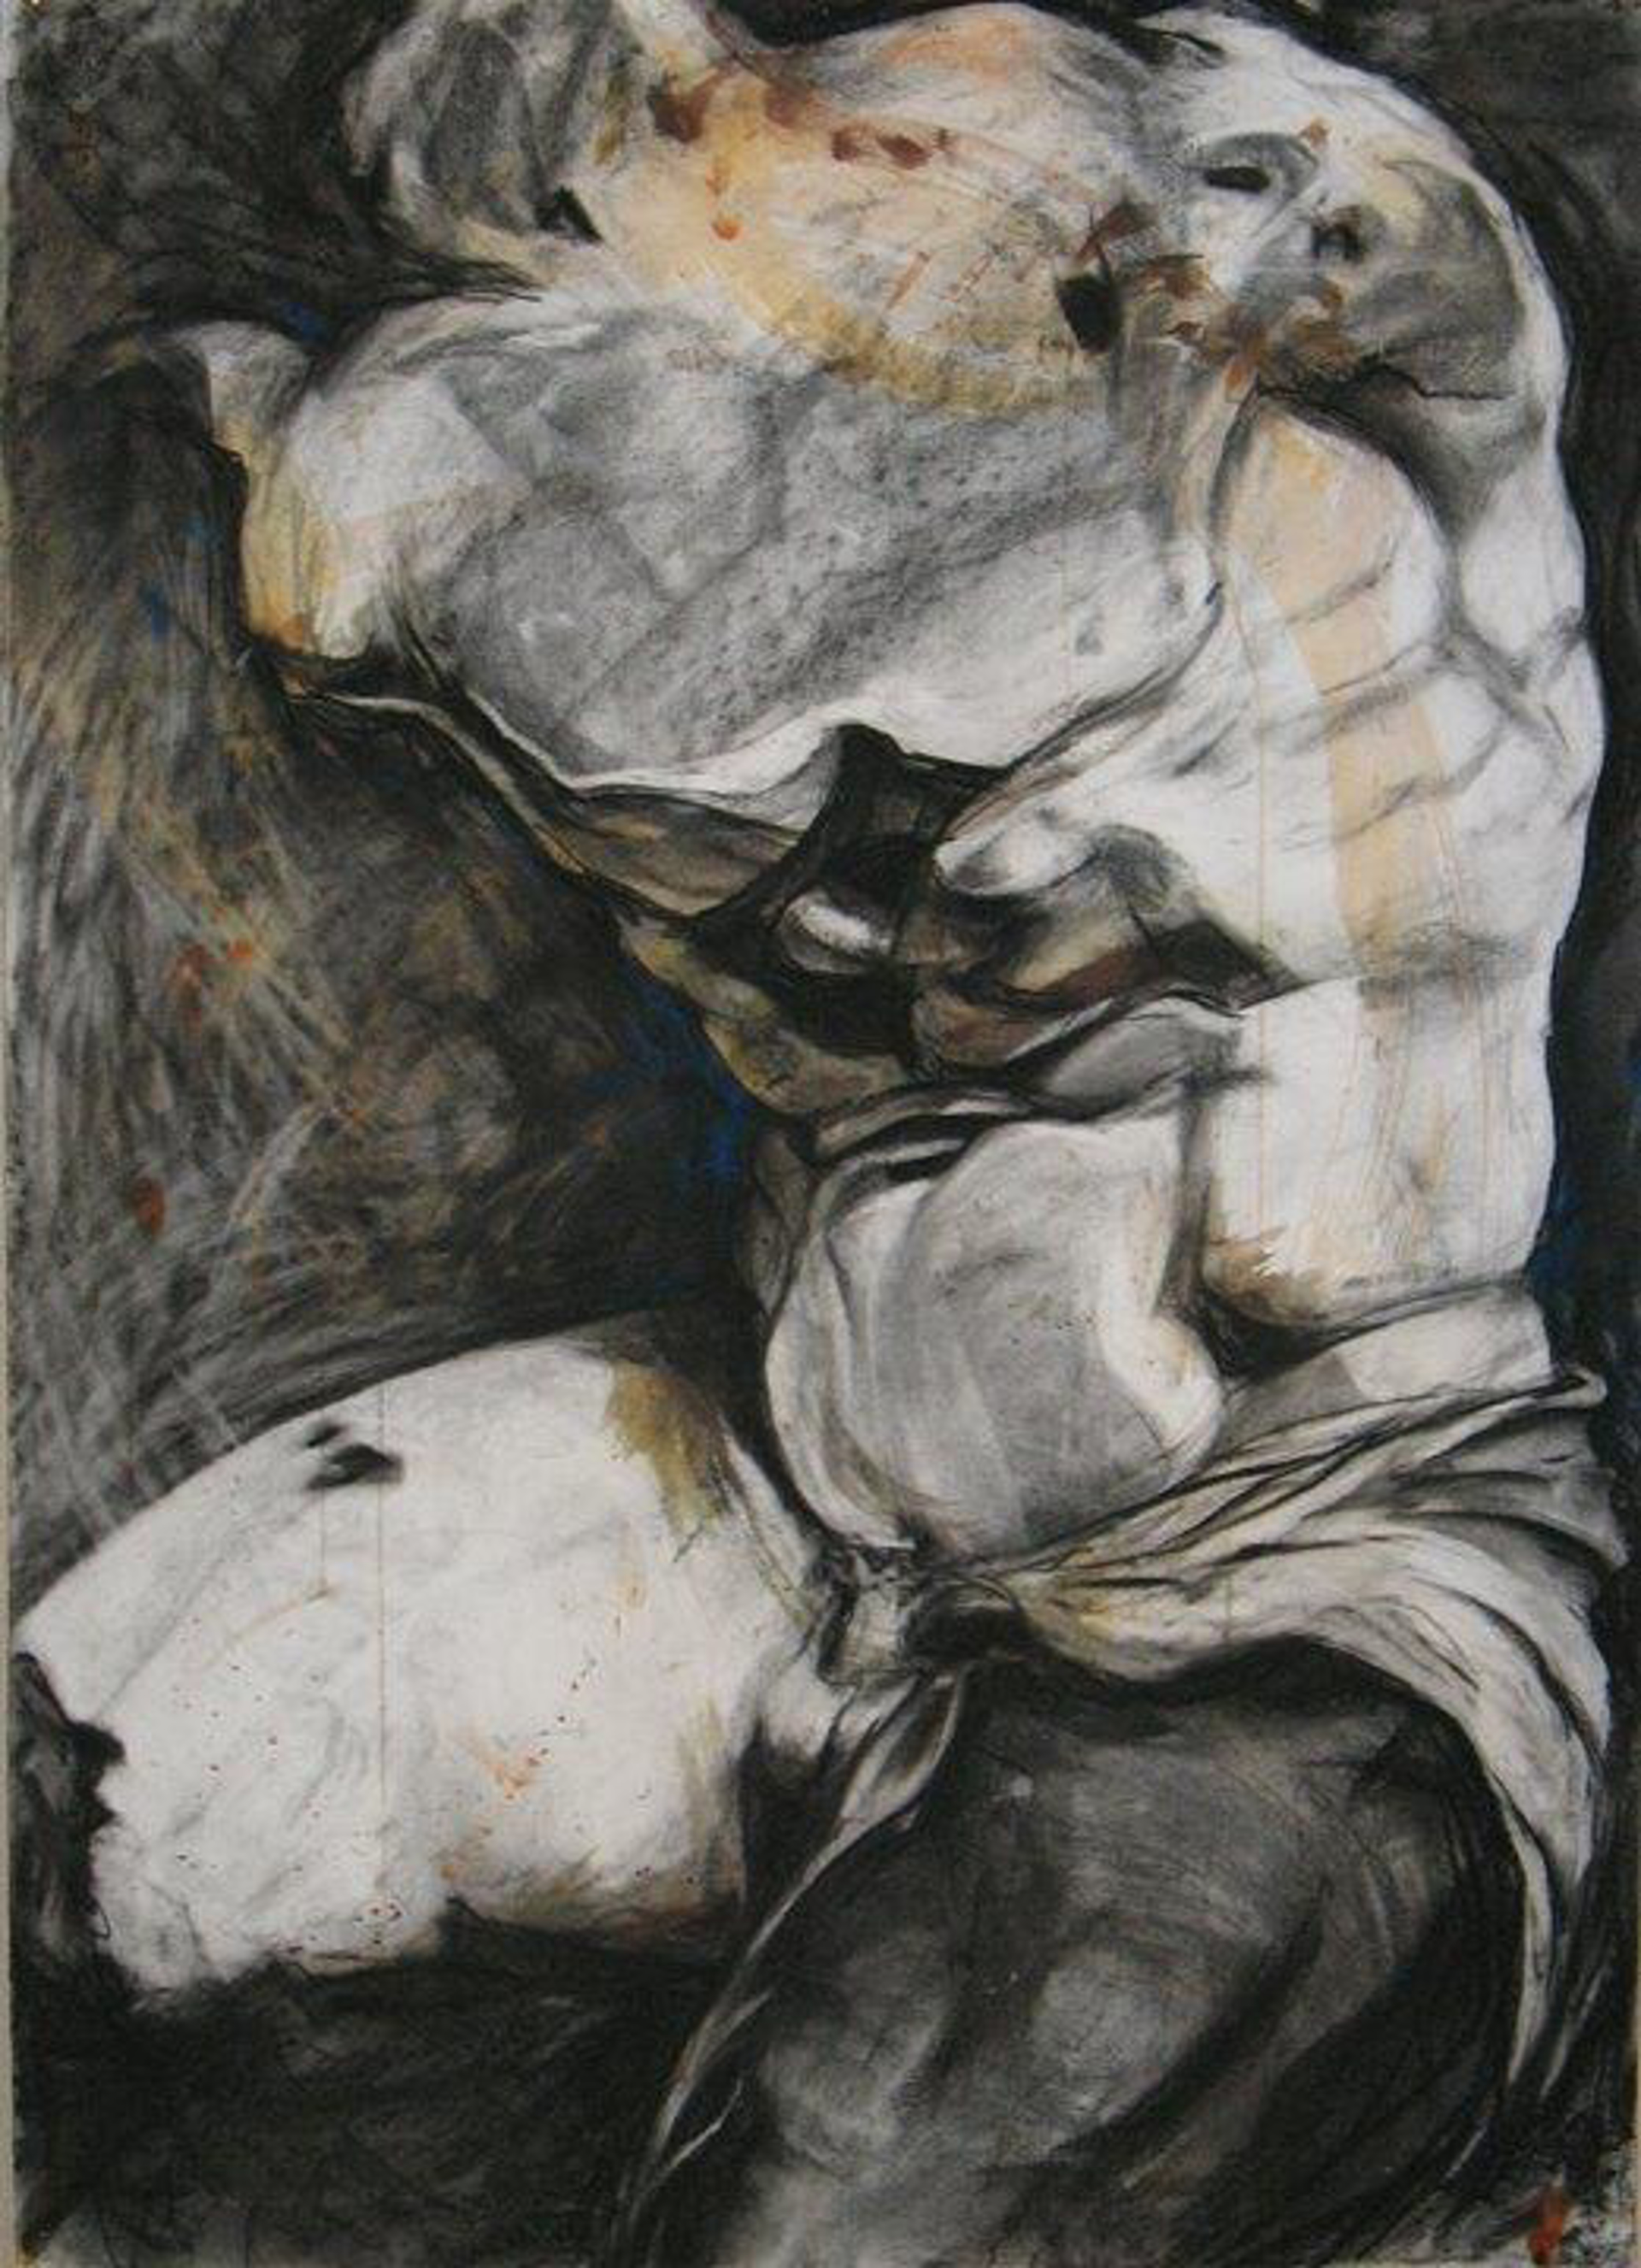 Belvedere Torso 1 Side by Lisa VanderHill